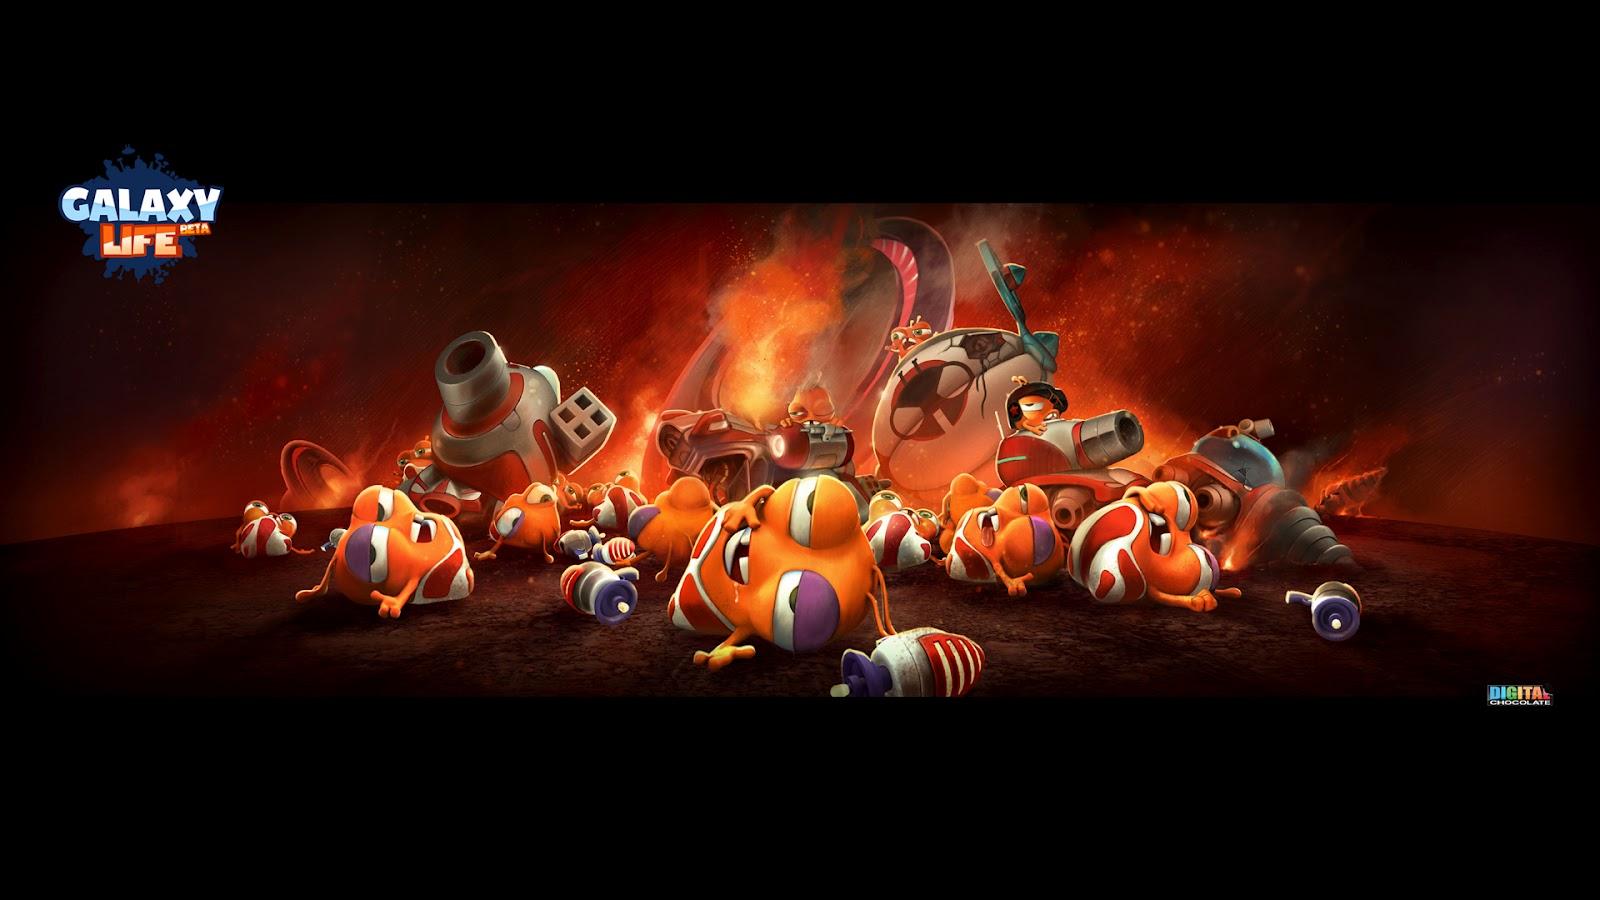 http://1.bp.blogspot.com/-dsiySgPjeyE/USG_RHNRBdI/AAAAAAAAb-8/tJ7OdyqBt3Y/s1600/galaxy+life+wallpaper+(6).jpg